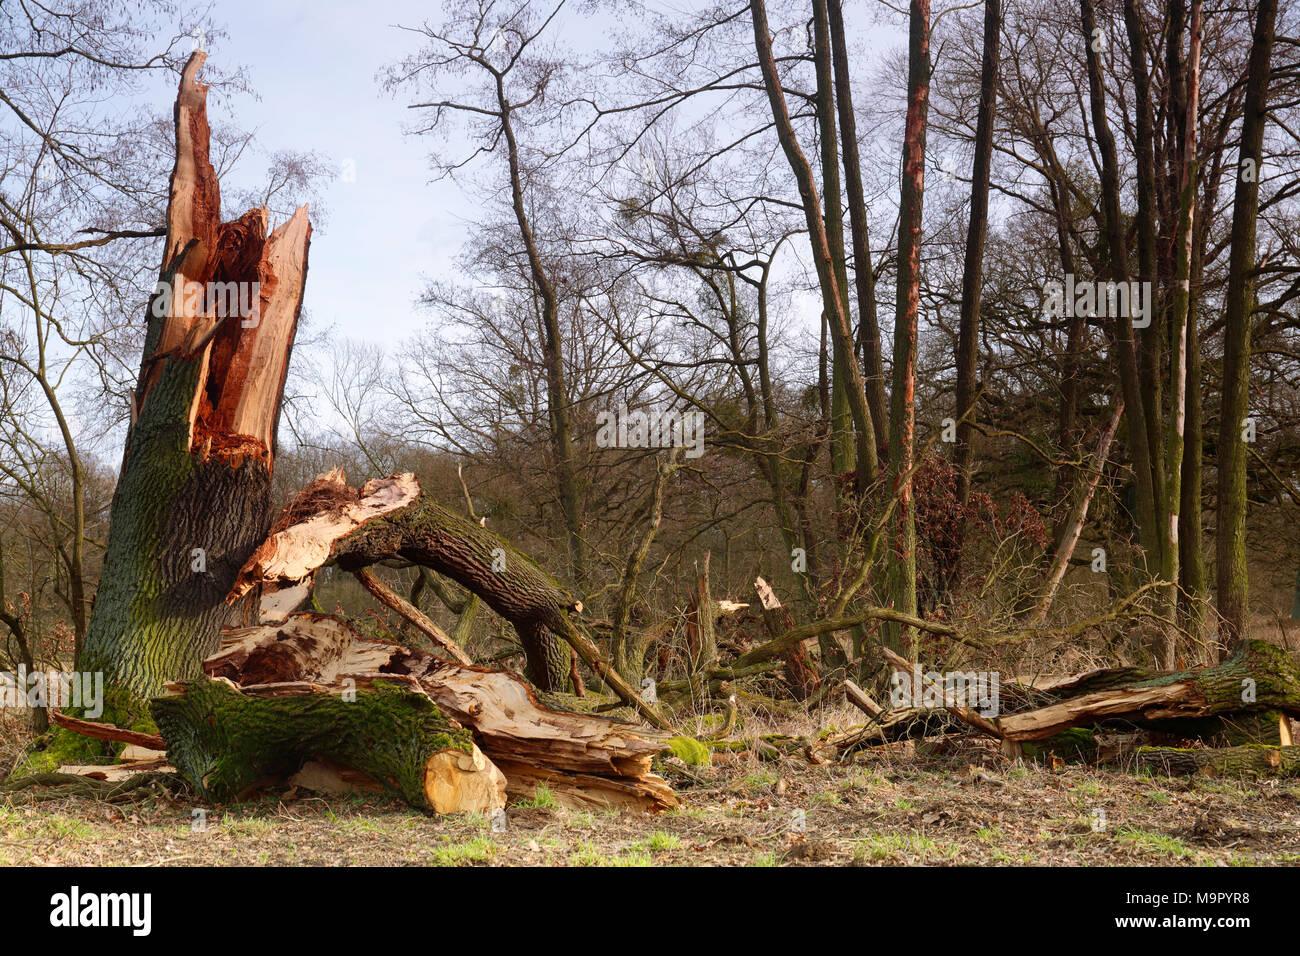 Windthrow of an oak, Biosphere Reserve Middle Elbe, Dessau-Roßlau, Saxony-Anhalt, Germany - Stock Image